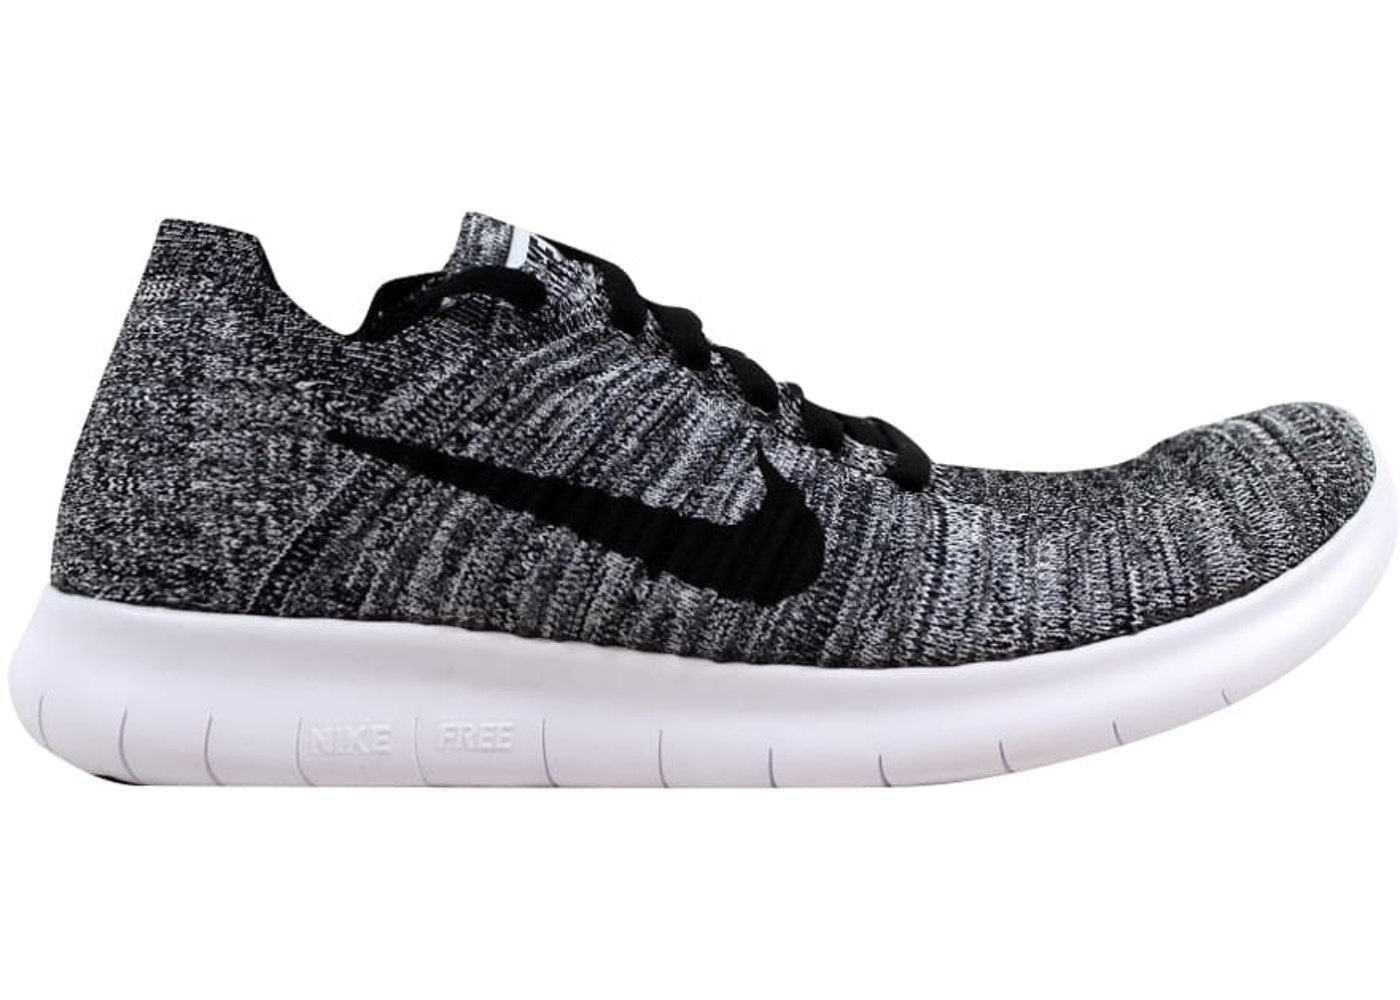 50% alennus 100% aito virallinen Nike Free RN Flyknit White/Black